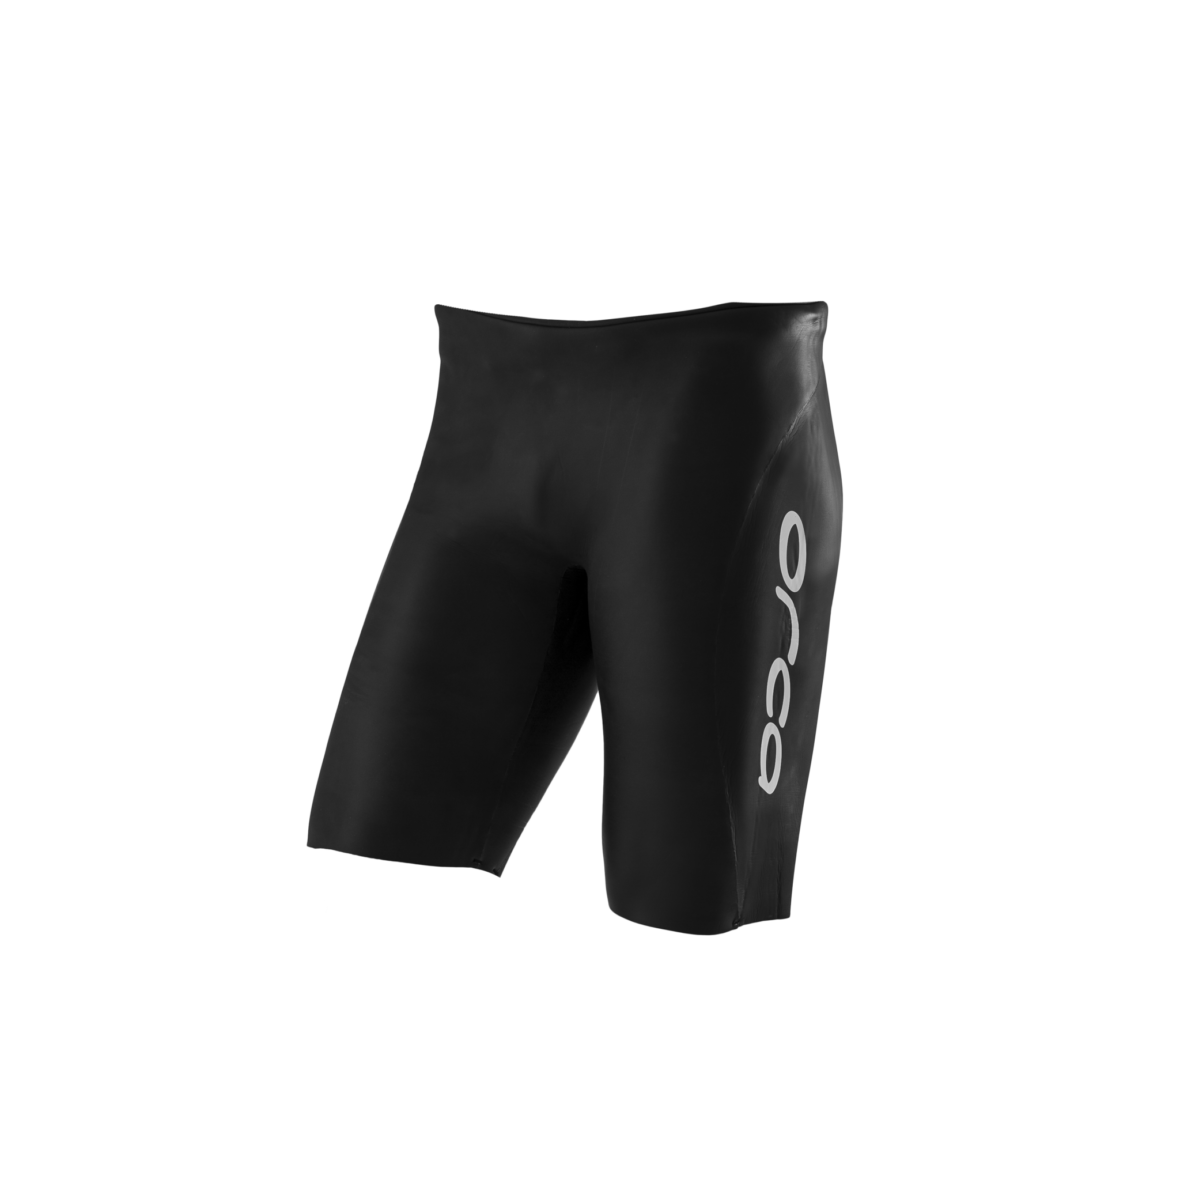 7196f8a1 Orca Neoprene Shorts | Orca Neoprene Buoyancy Shorts | Justwetsuits